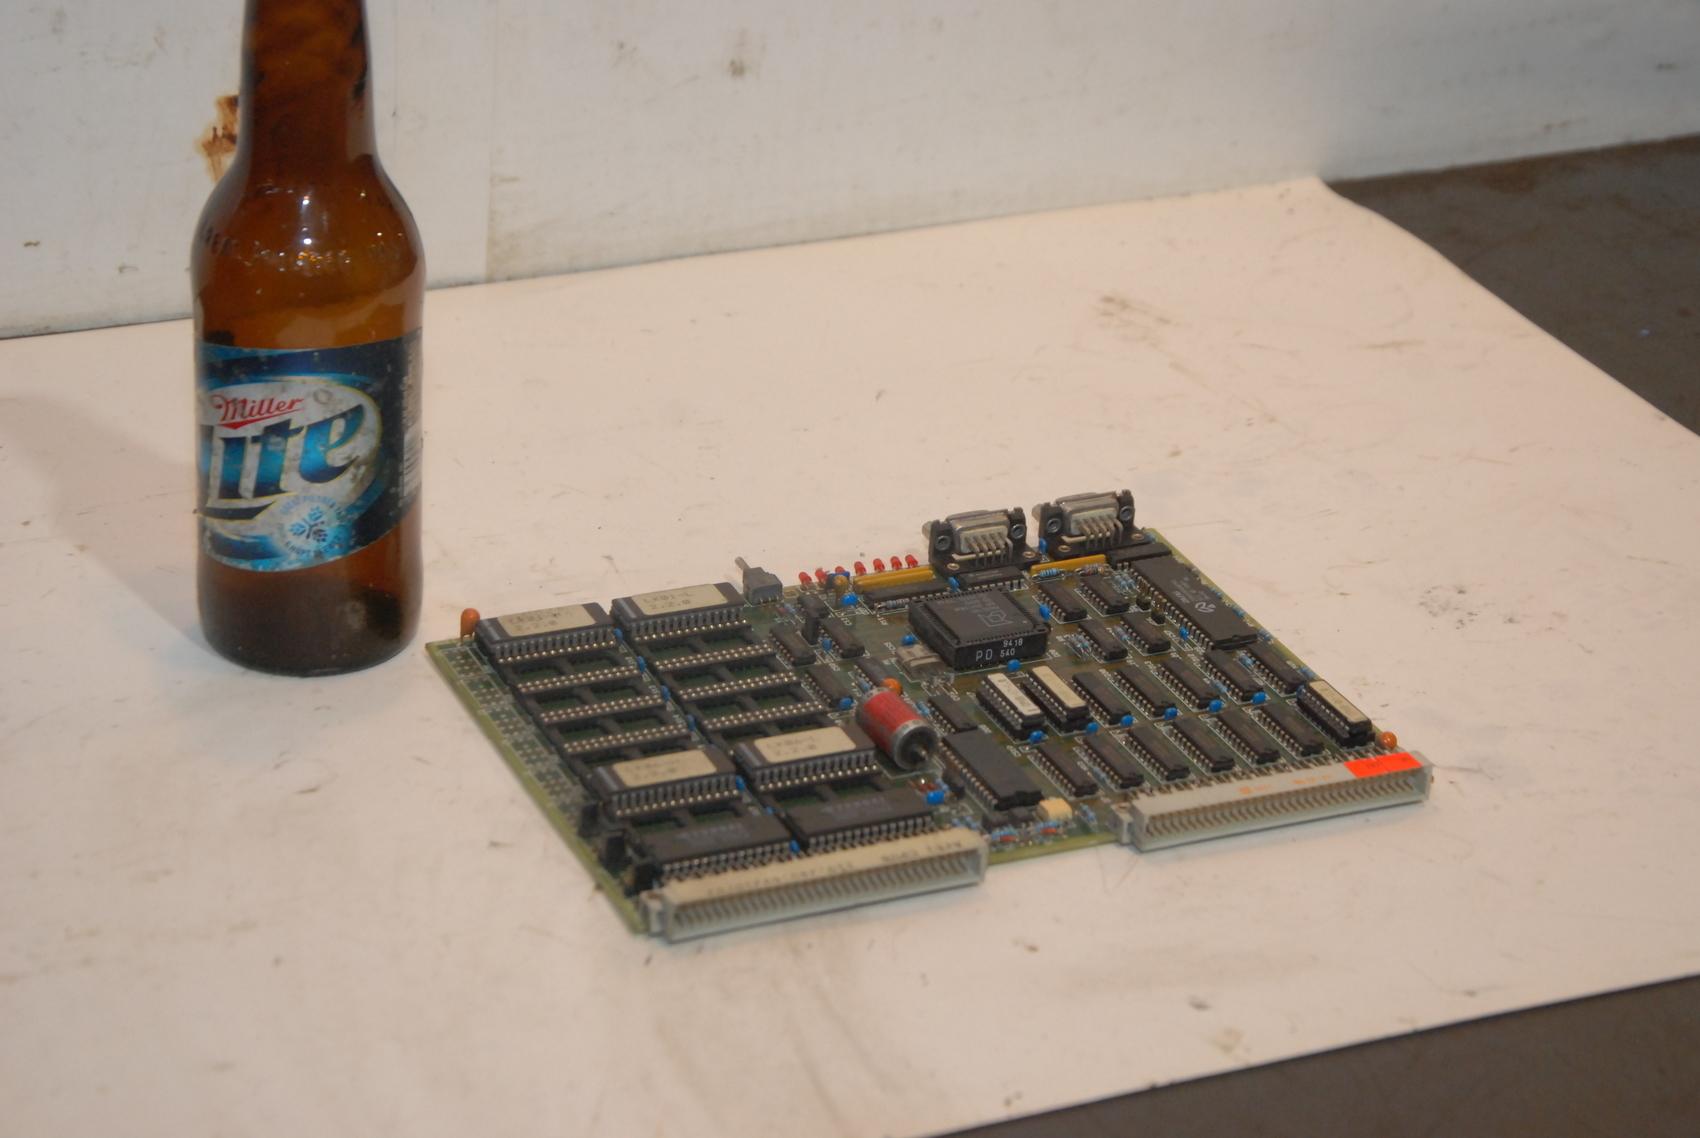 Netstal 110.240.6921c/02 Lotseite Circuit Board